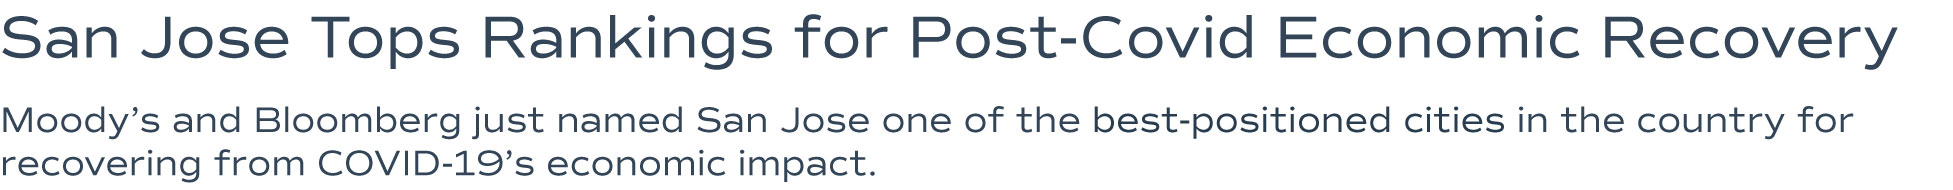 Blog-aggregate-sj-2